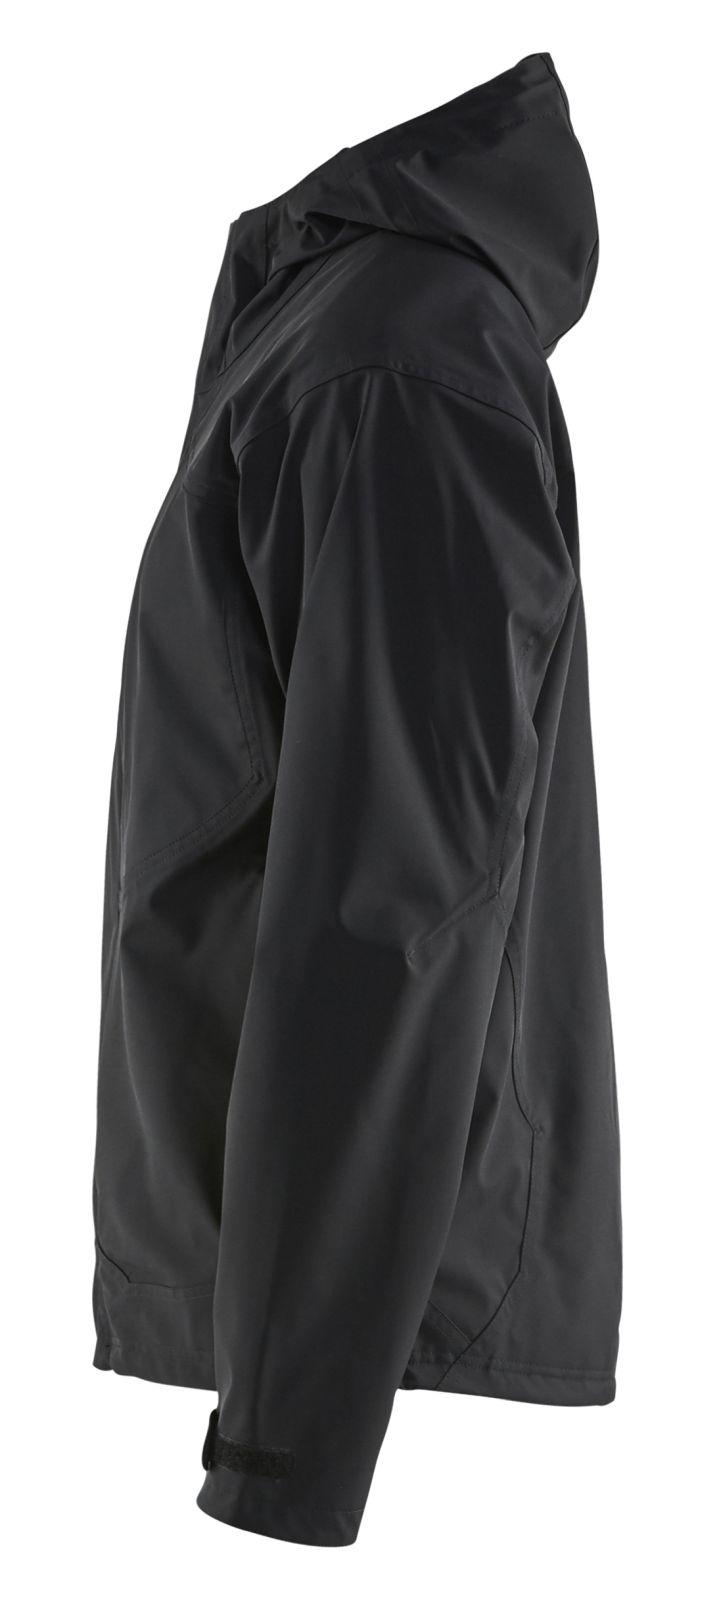 Blaklader Regenjacks 48961965 zwart(9900)